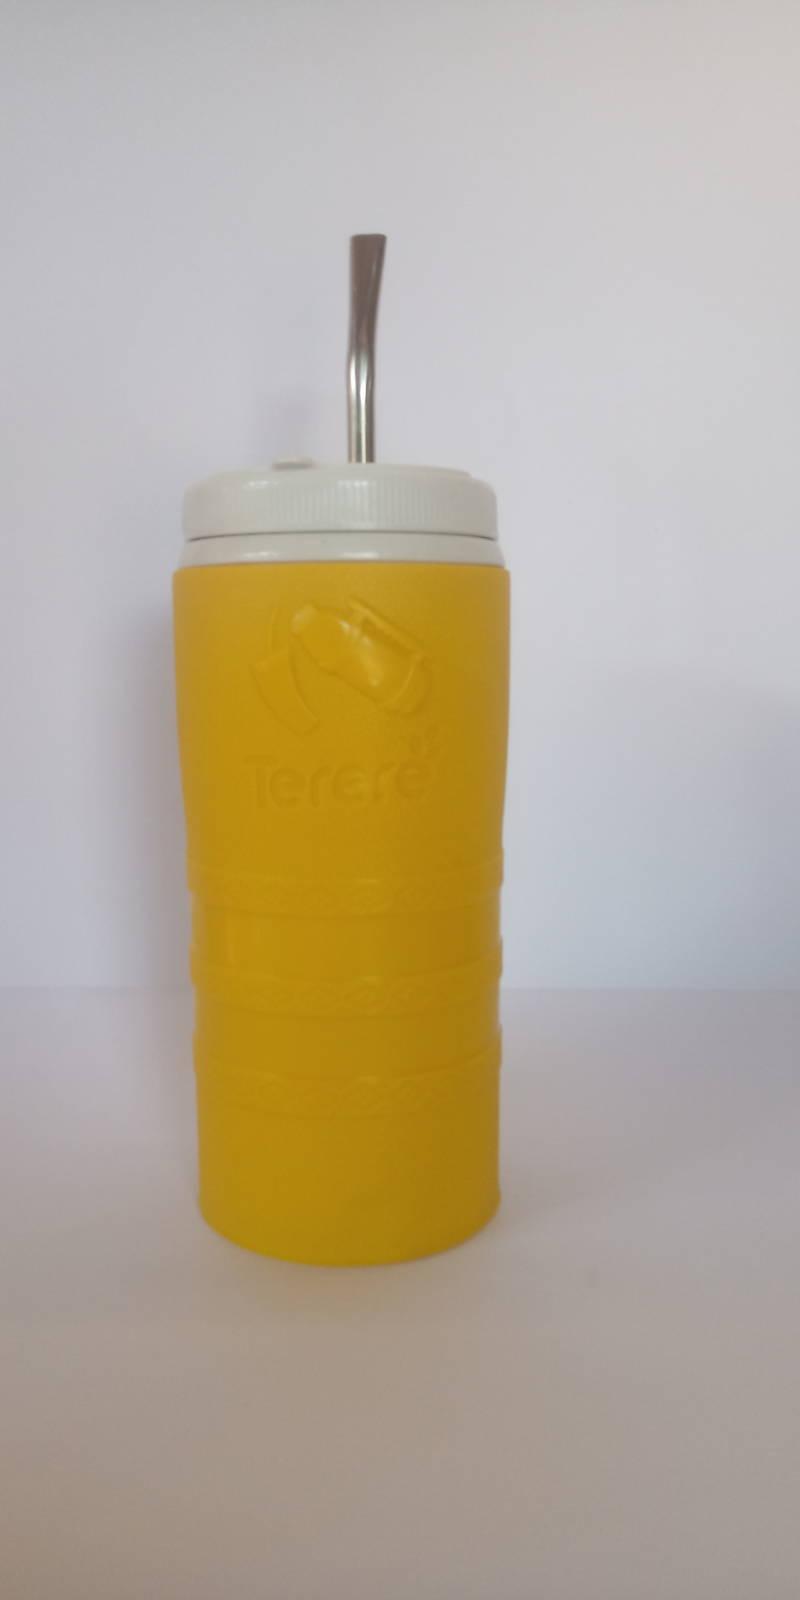 brasilsuldistribuidora_com_br garrafa arte couro para terere plastico com bomba cinza copia